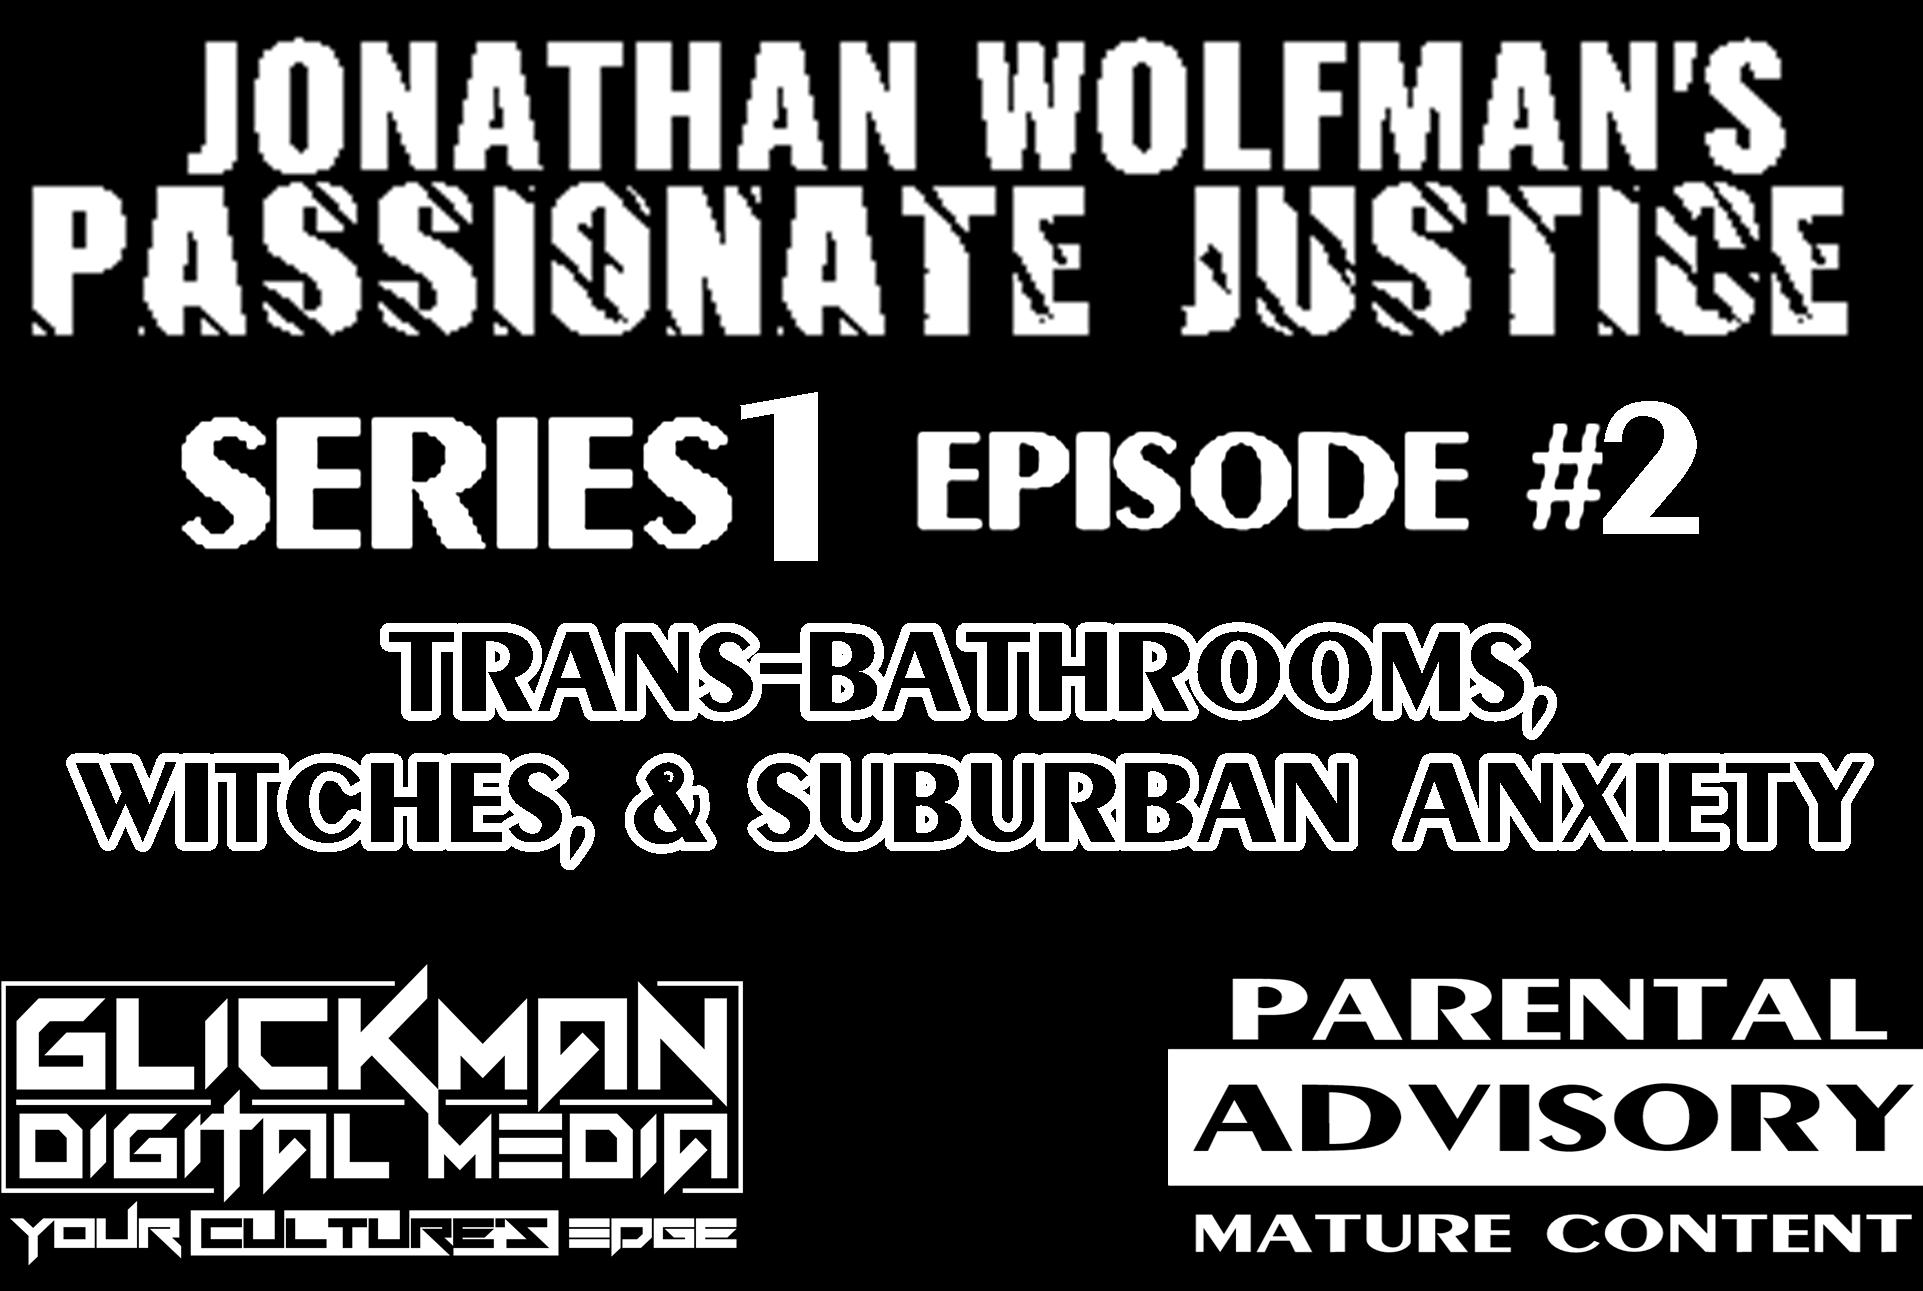 PJ  GDM POSTER 2  TRANS-BATHROOMS black.png